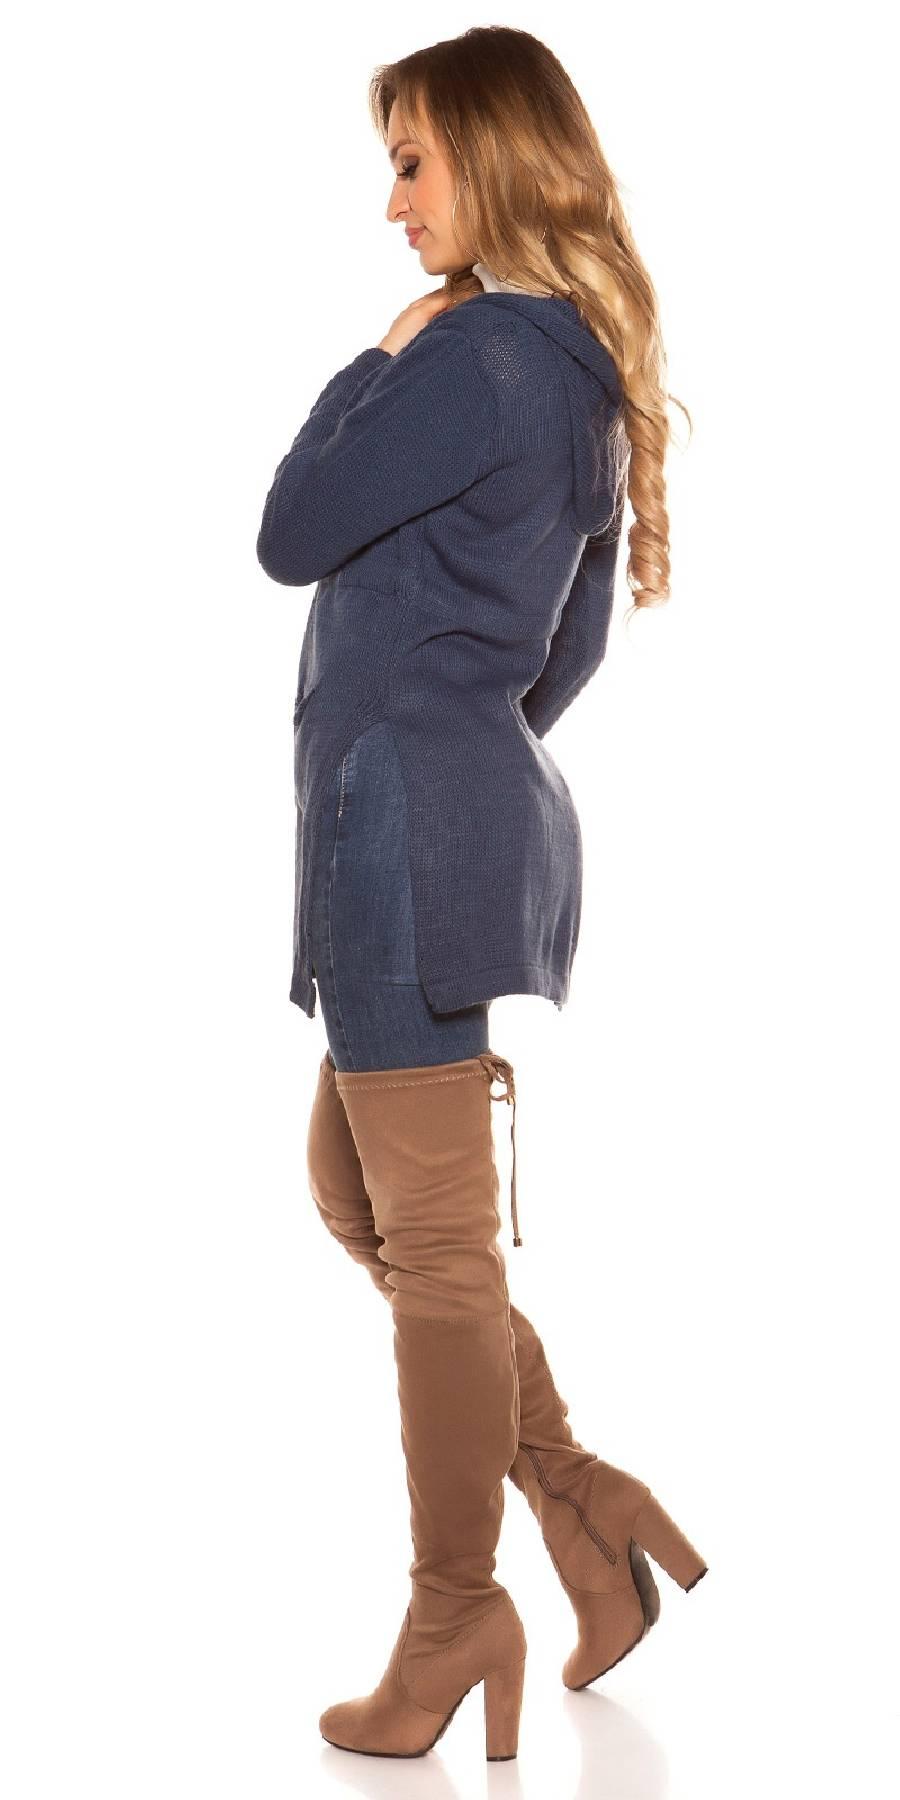 Robe femme tendance ASLI couleur beige